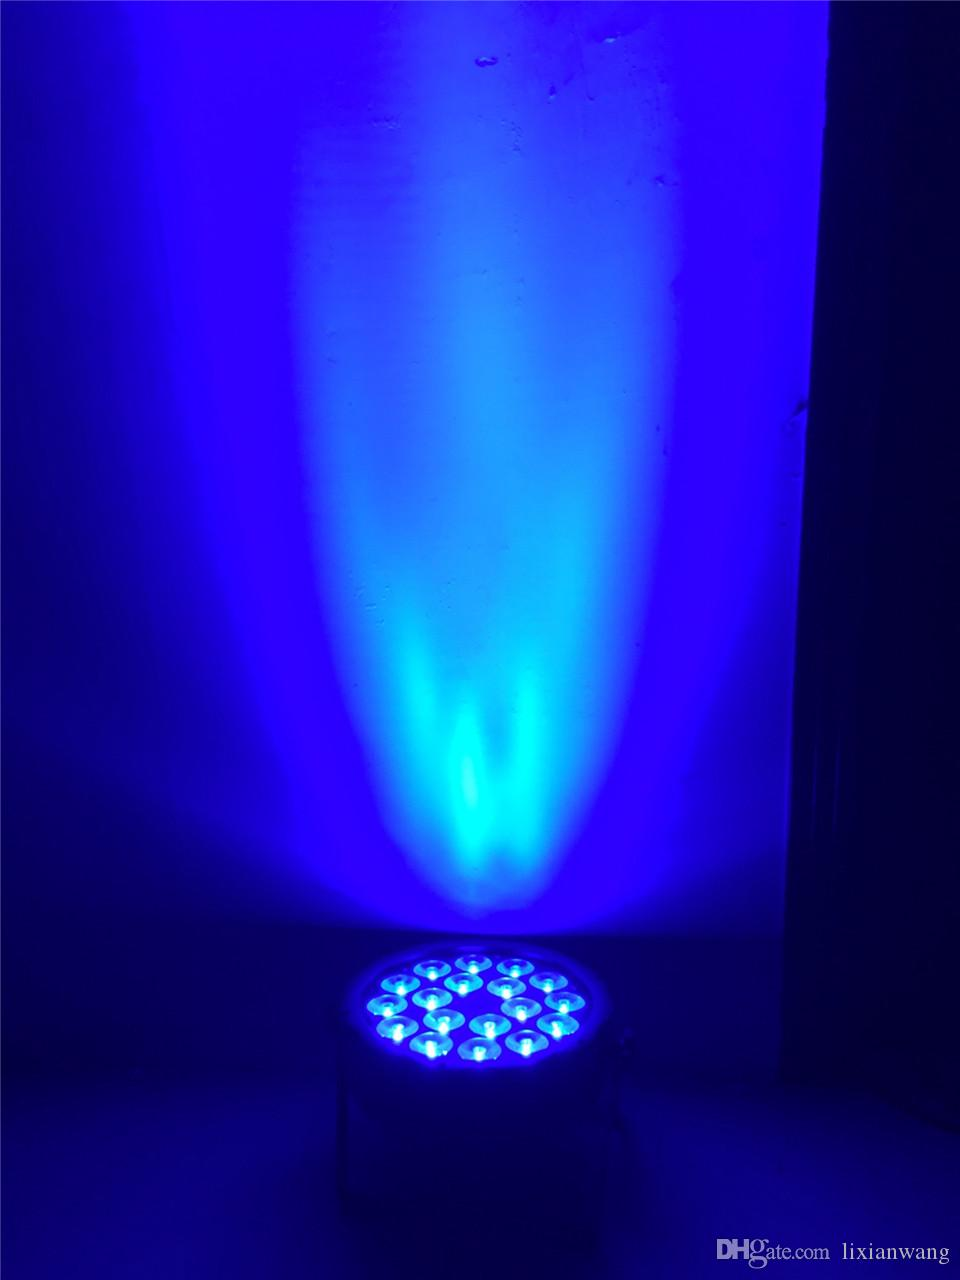 18X12 W RGBW بقيادة الاسمية لوسي DMX أضواء المسرح لوسي D'AFFARI Professionale بيتو الاسمية يمكن لكل ايل برتيتو KTV discoteca ديل DJ ديلا Lampada